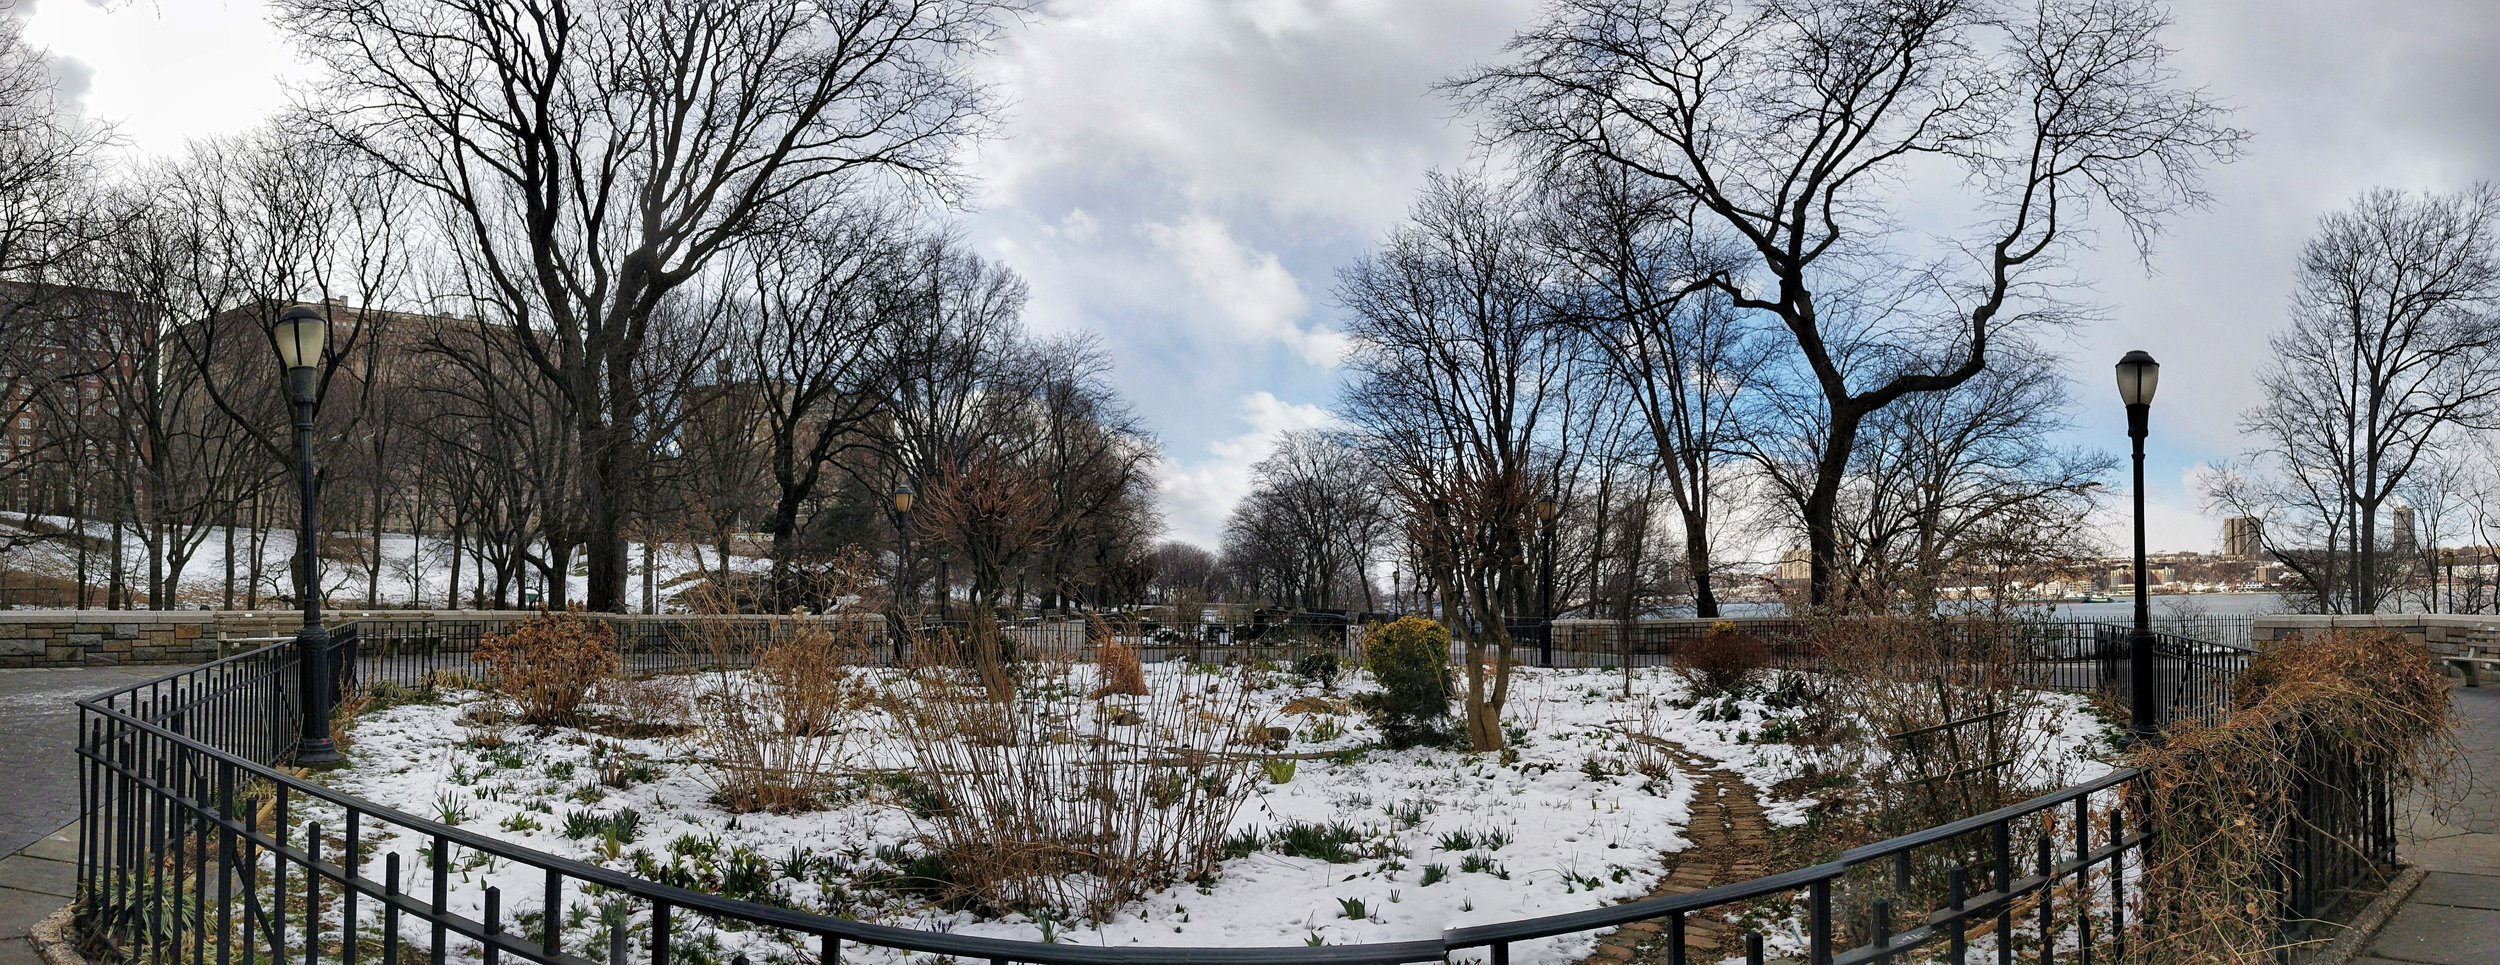 Location: 91st Street Garden (in Riverside Park near the Hudson at 91st Street)